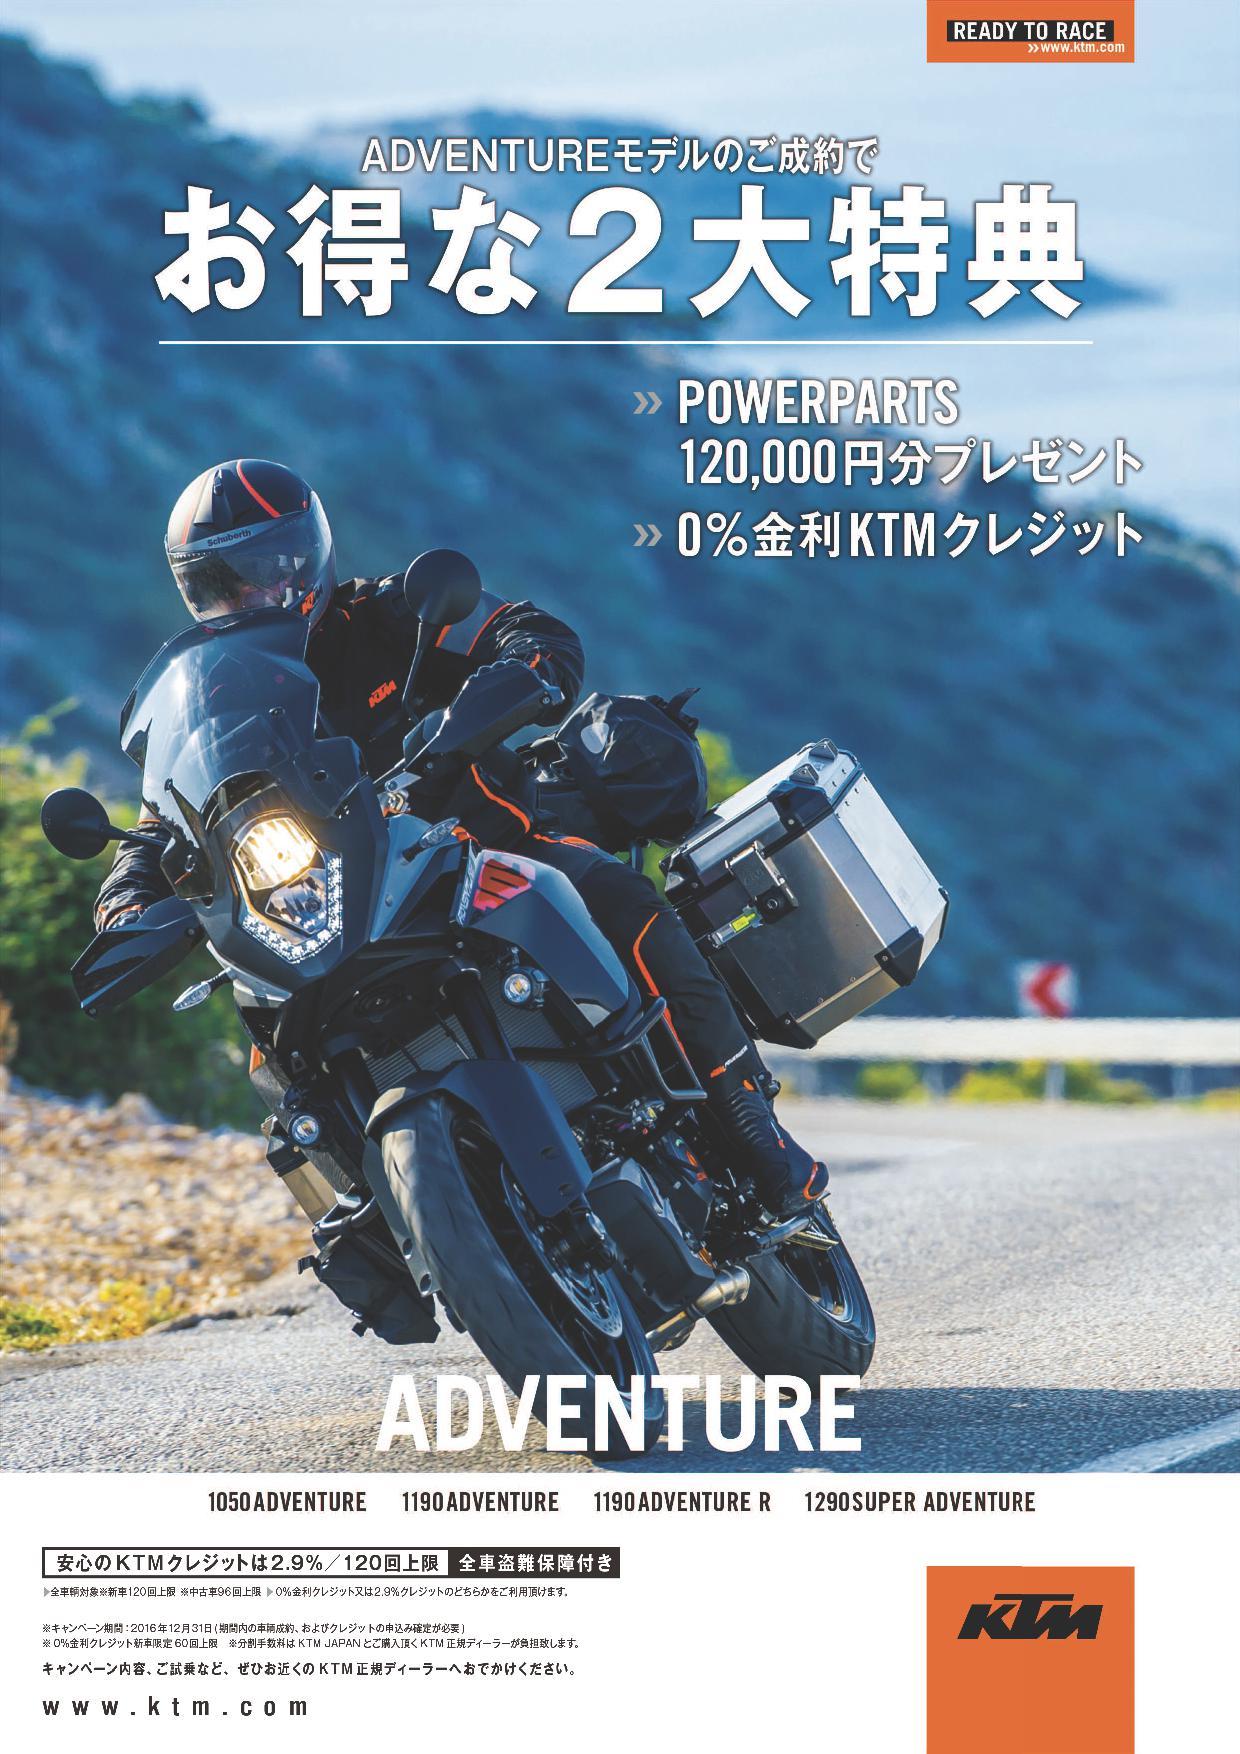 ktm_adventure20161018_a4